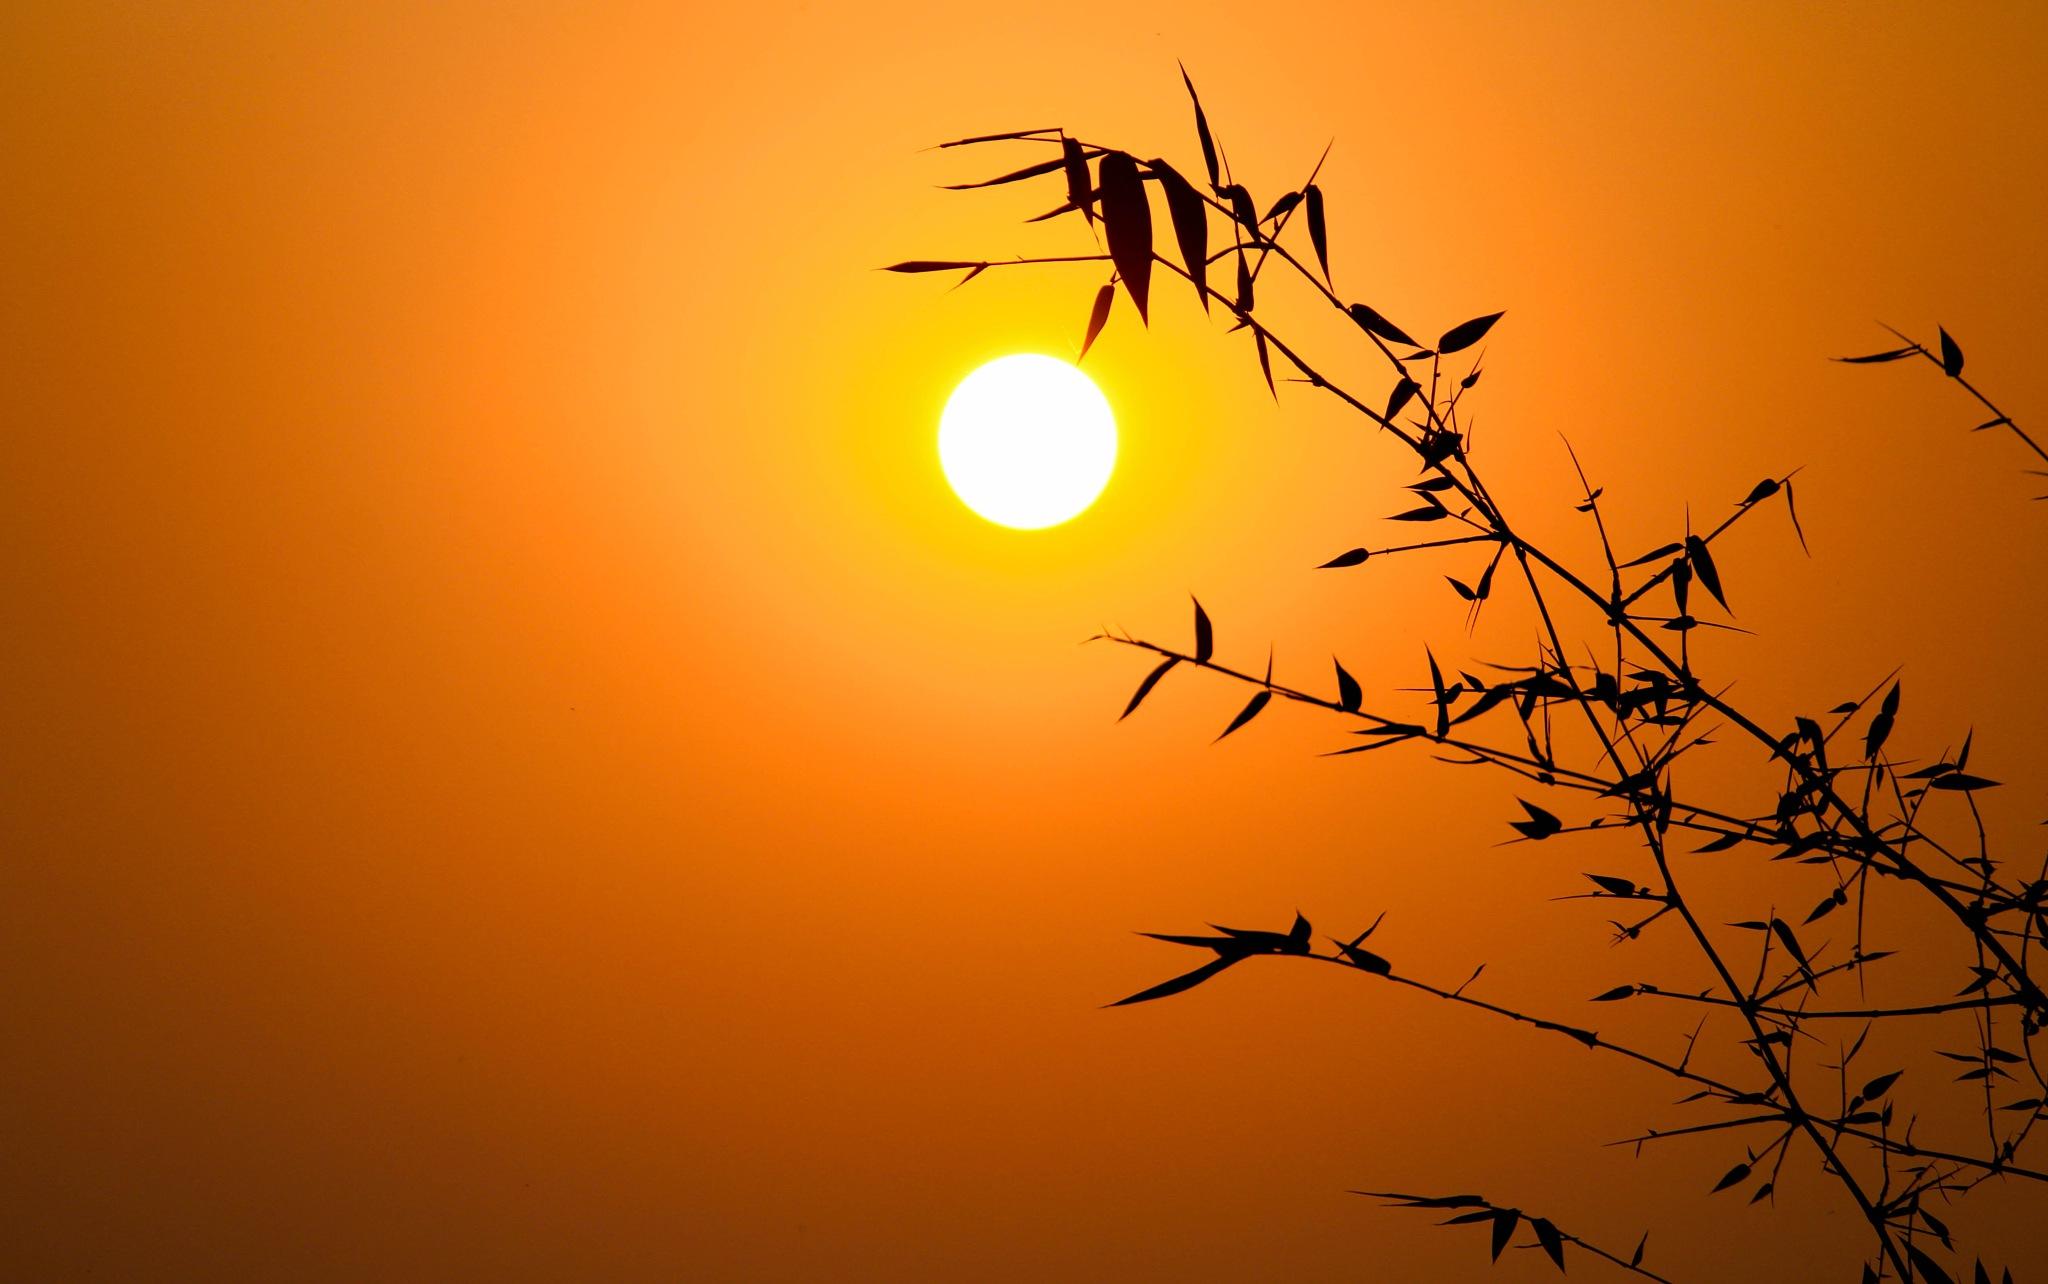 Dusk Time by Srinjoy Burman